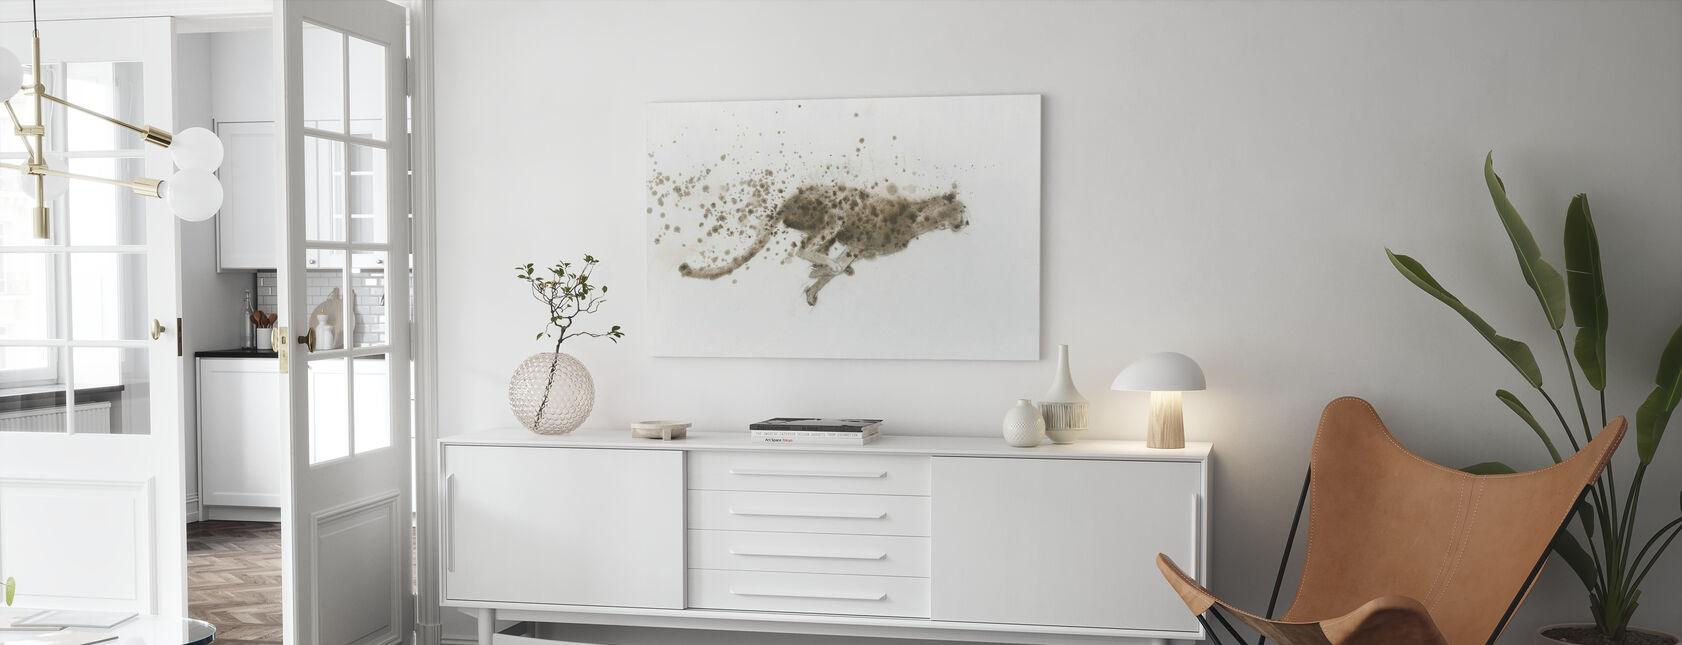 Cheetah - Canvastavla - Vardagsrum